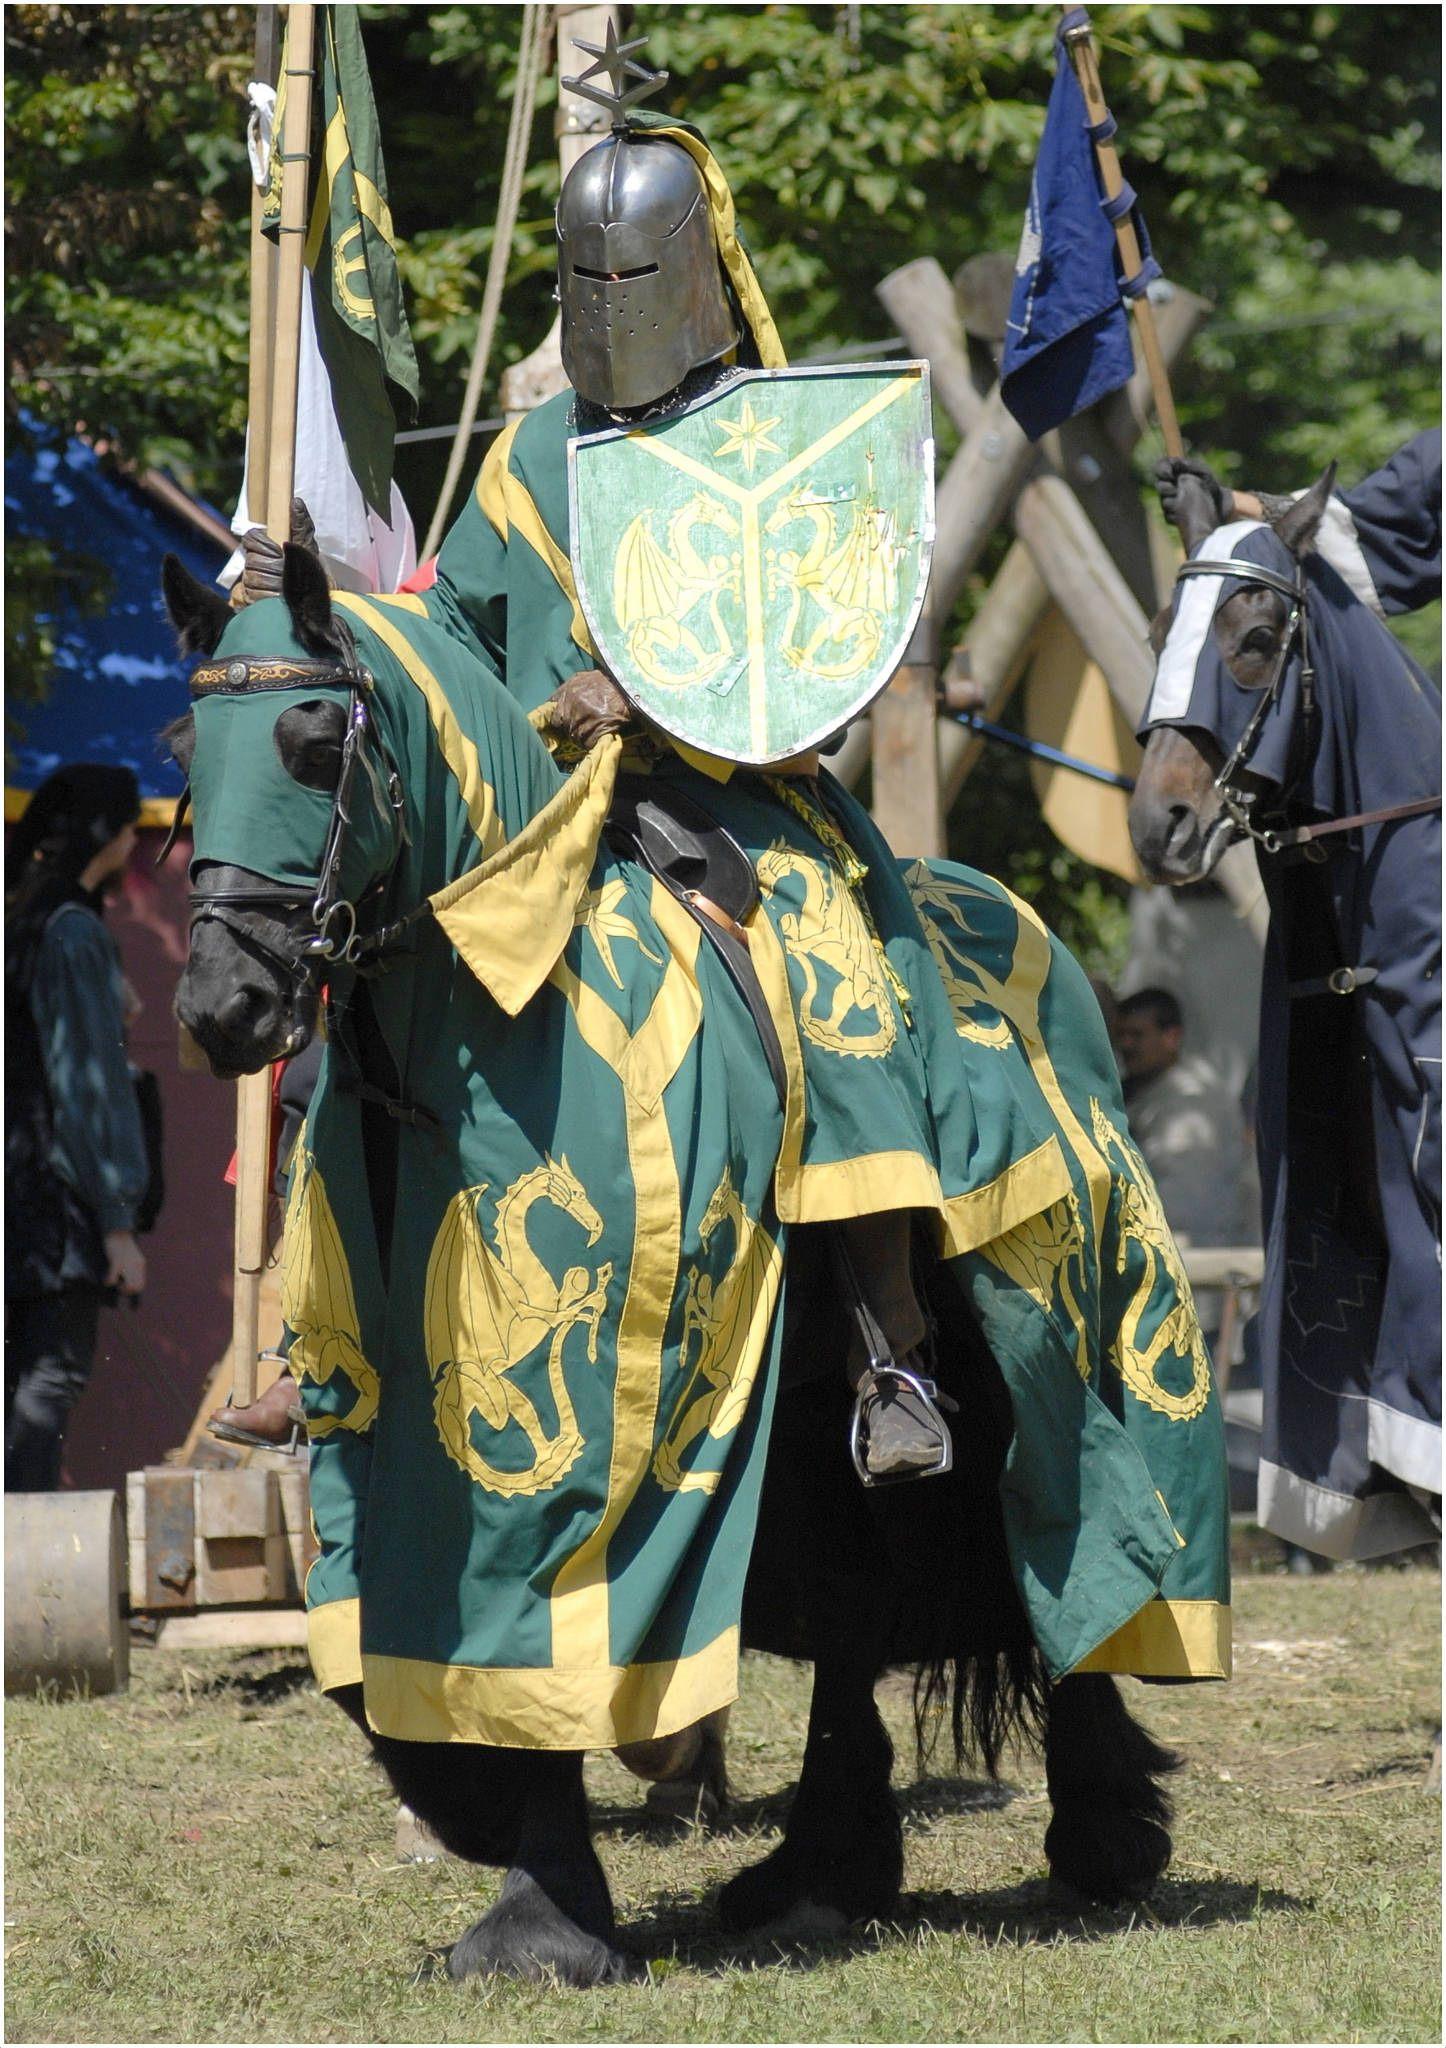 ritterturnier 2007 stetten ob lohnetal knight medieval and